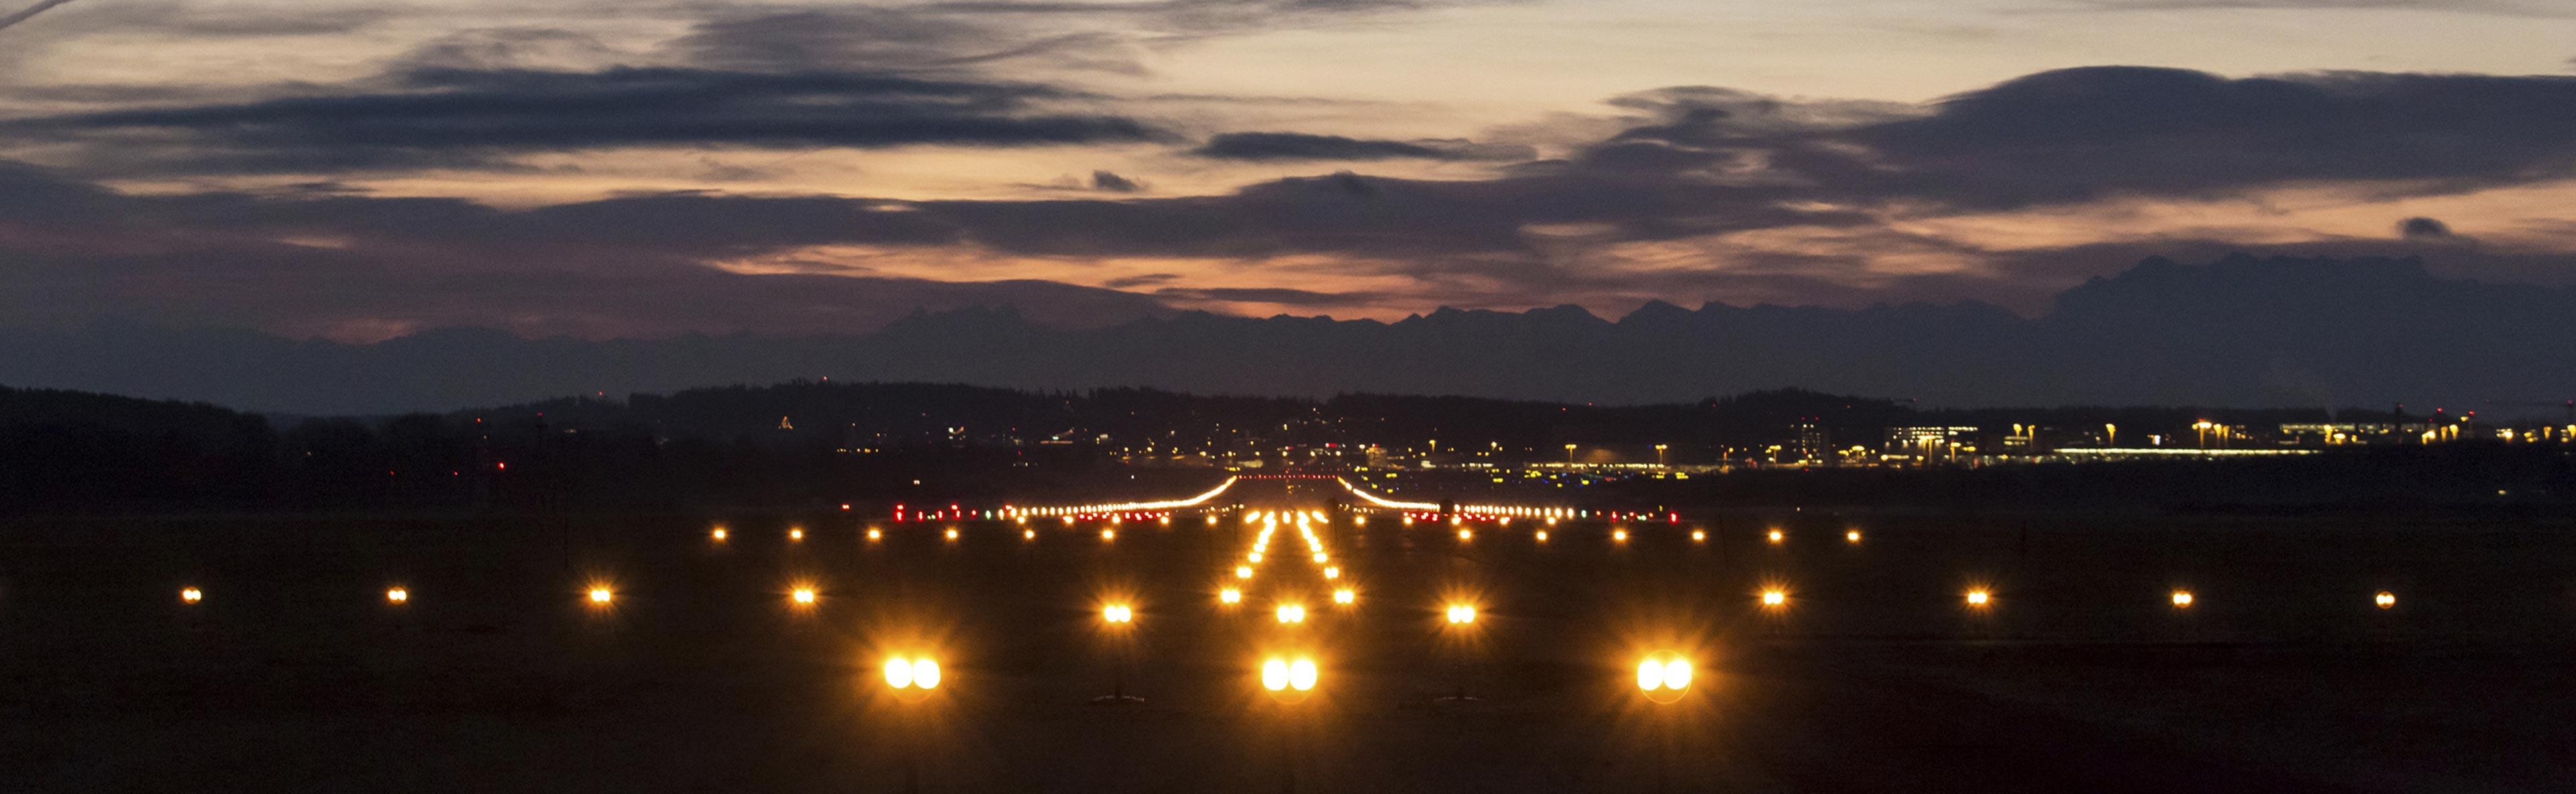 delta-box_aircraft-warning-lights-airport-and-heliport_slider